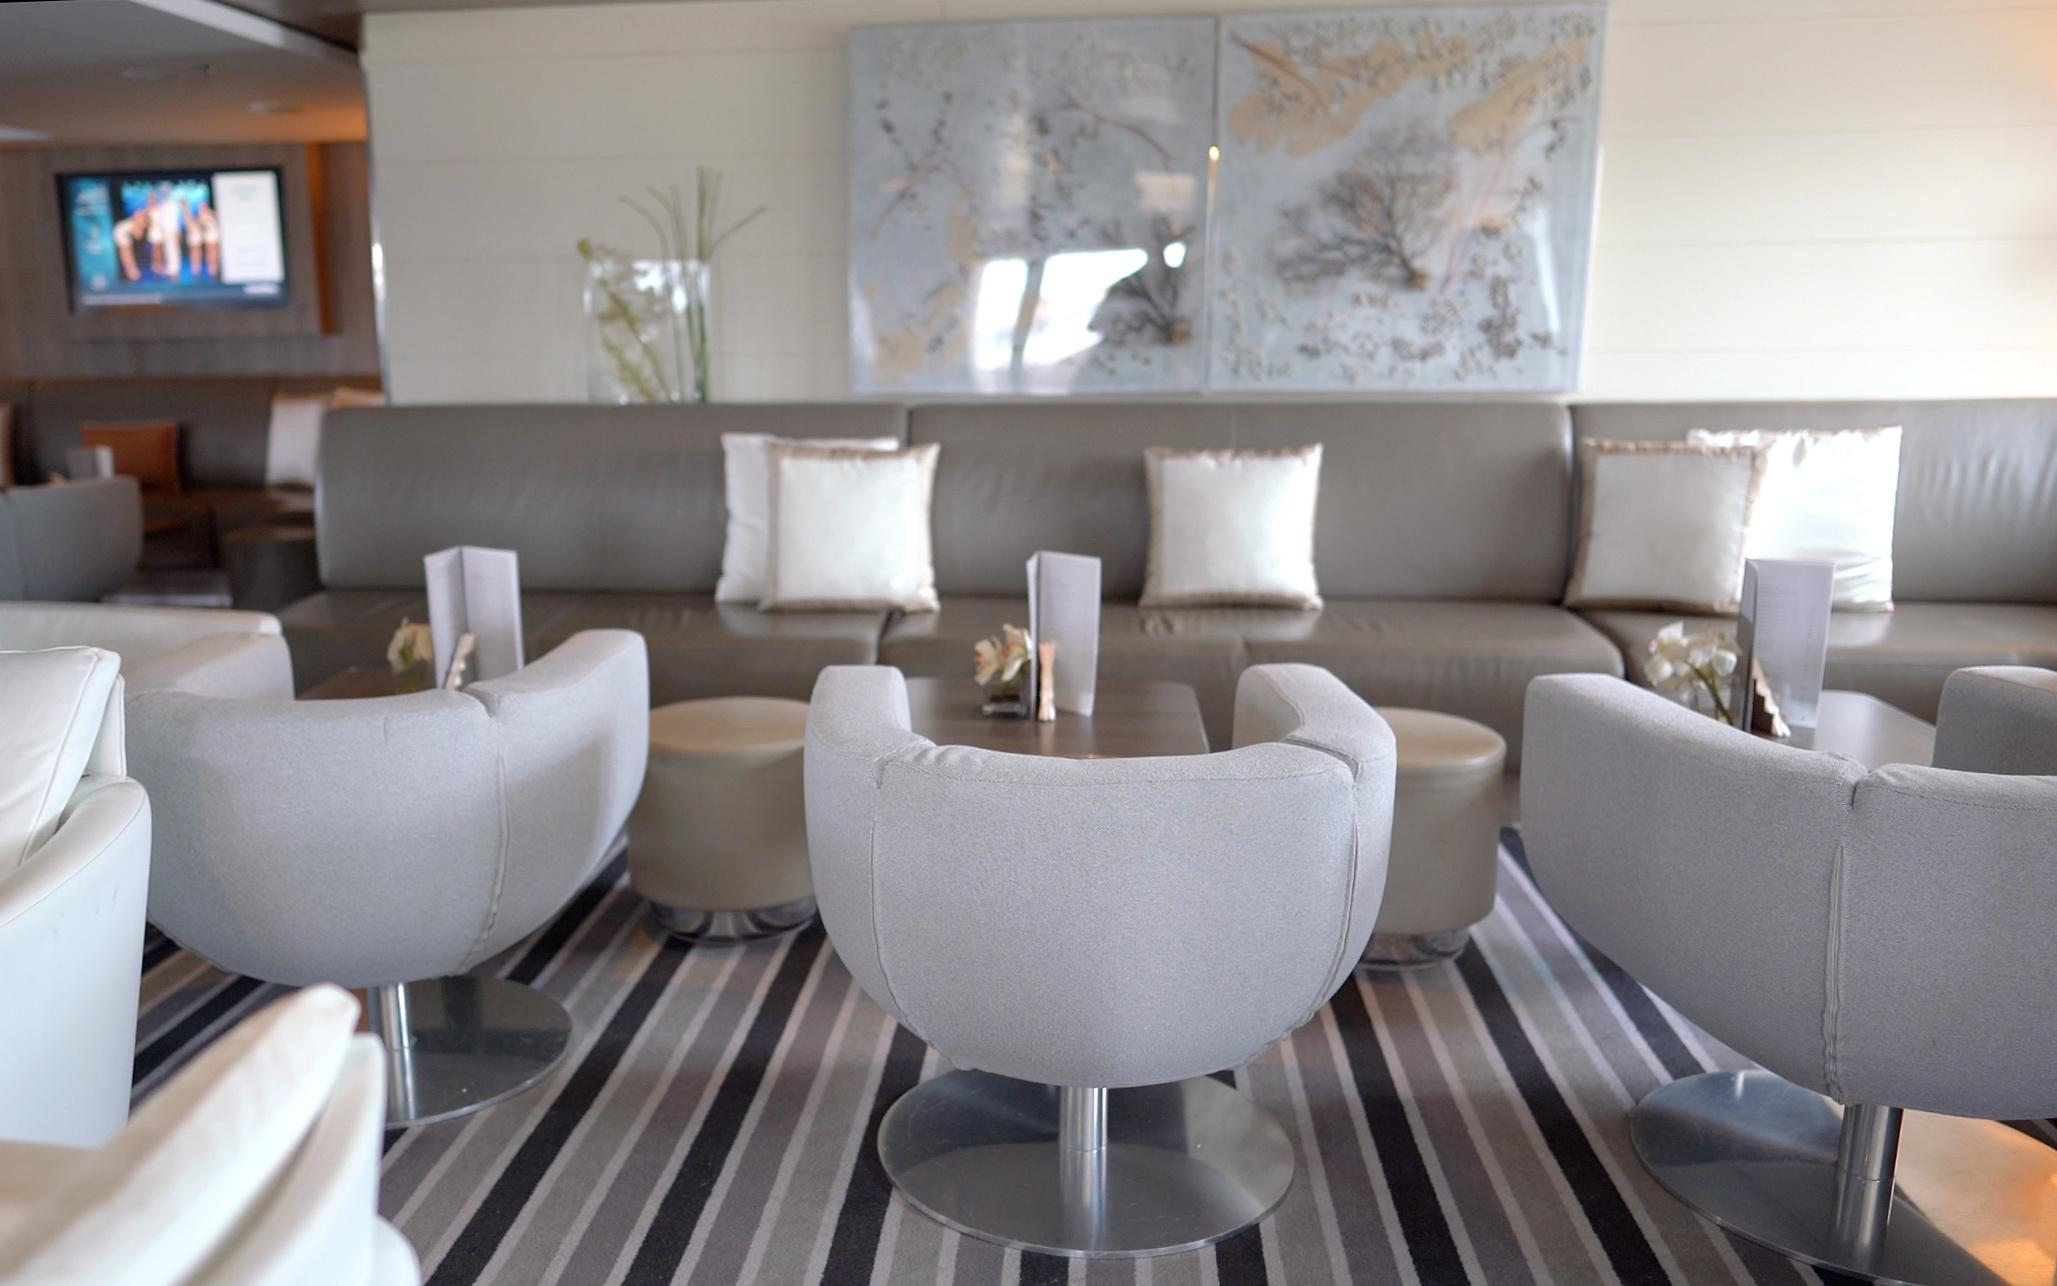 Lounge area seating.